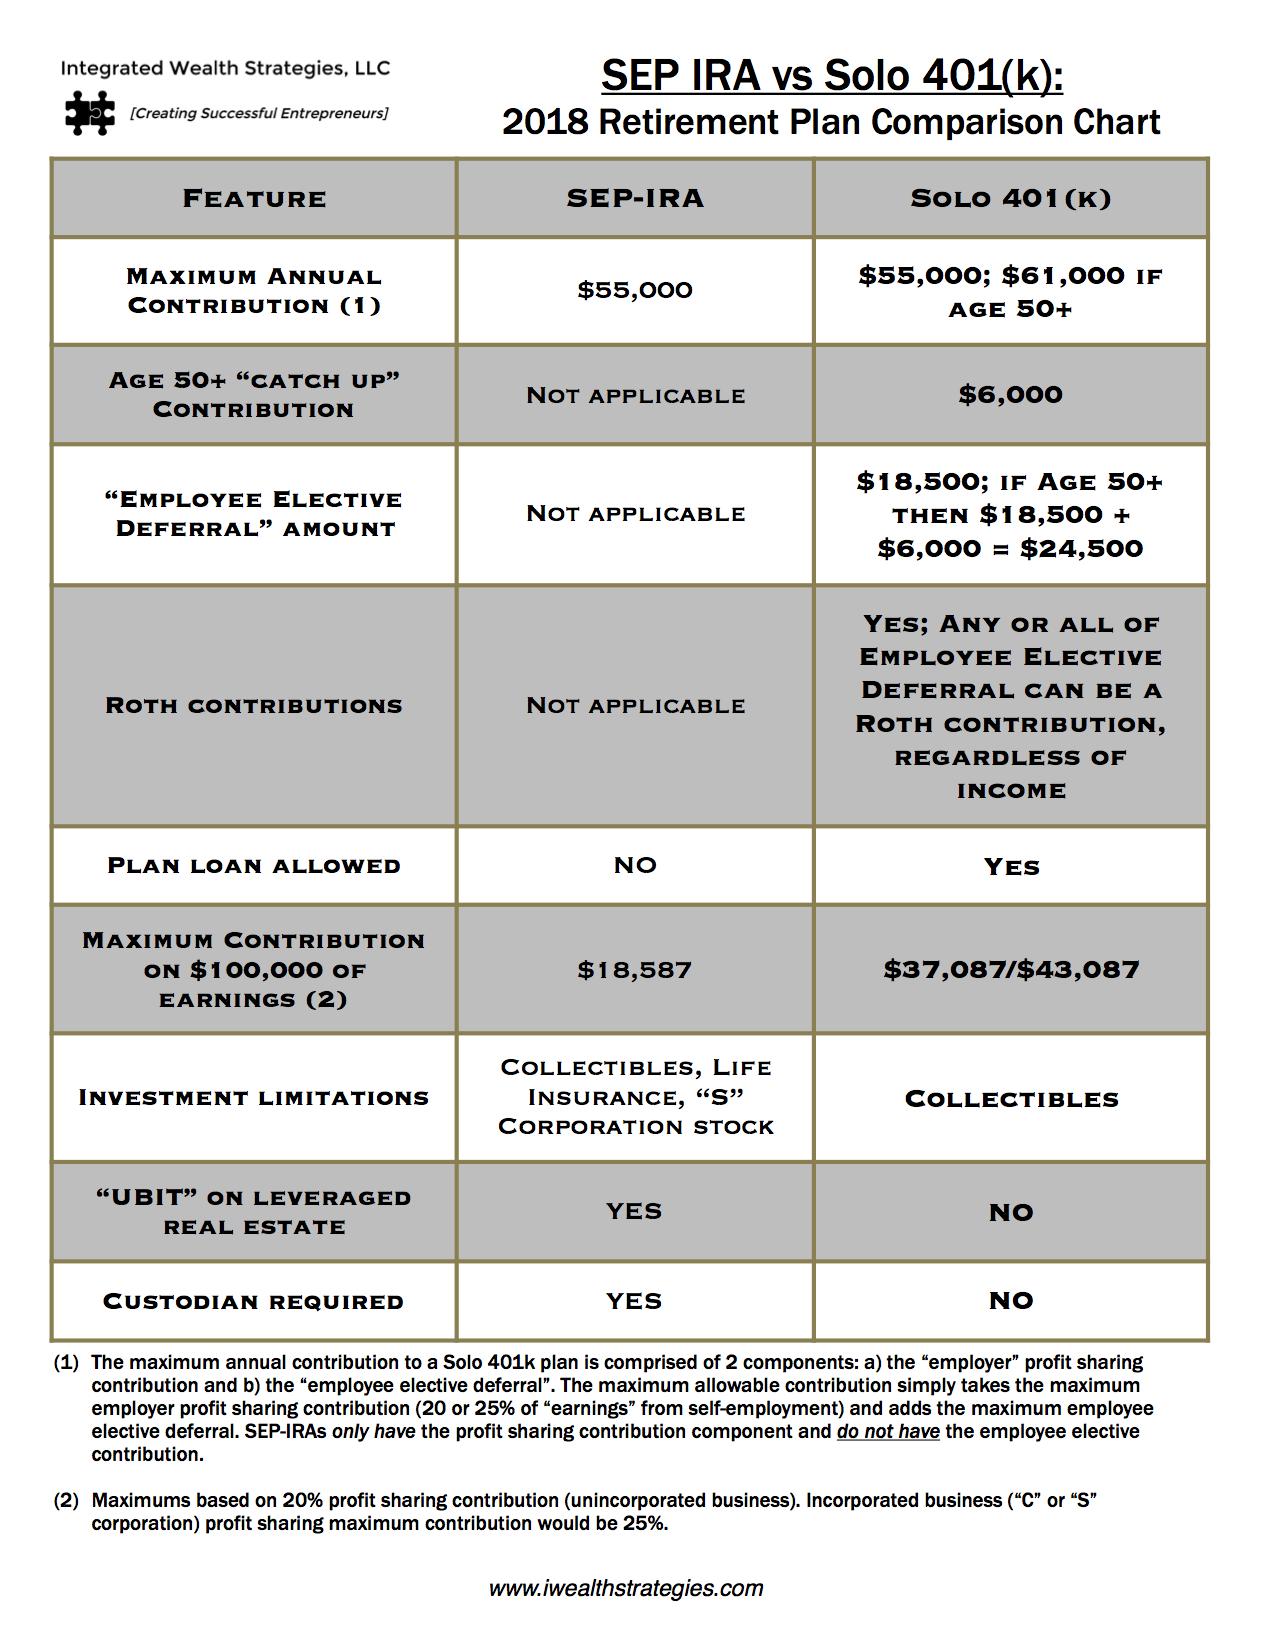 Solo 401 K Plan Integrated Wealth Strategies Llc